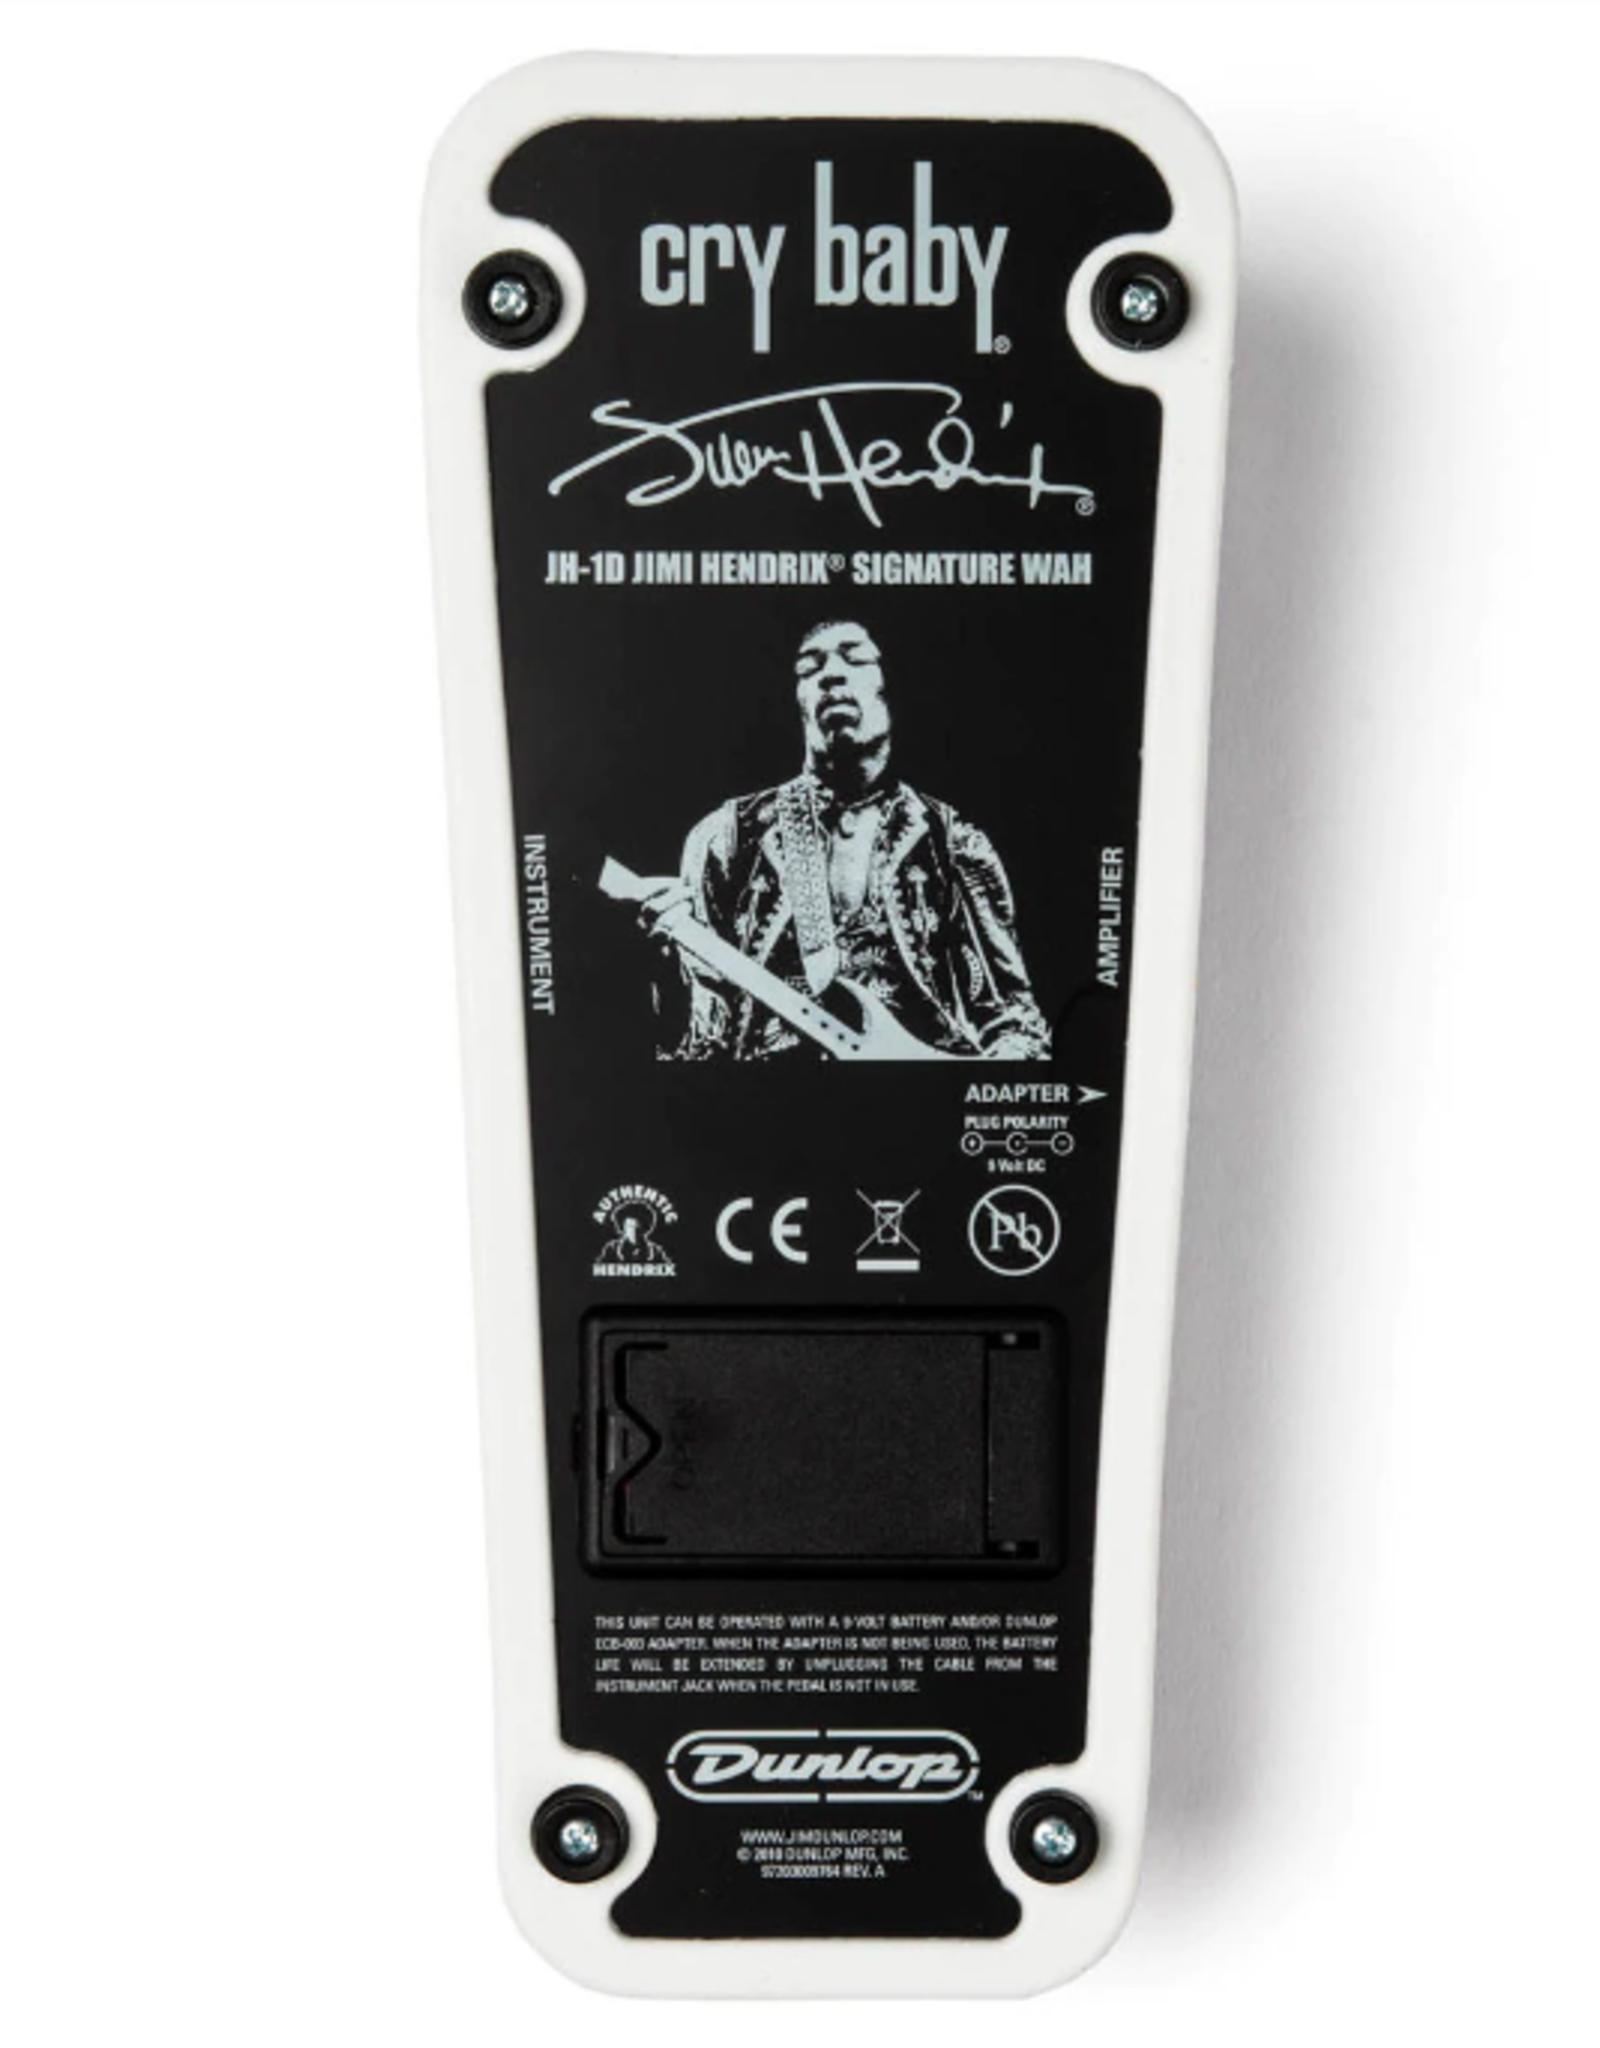 CRYBABY Dunlop Jimi Hendrix CryBaby Wah